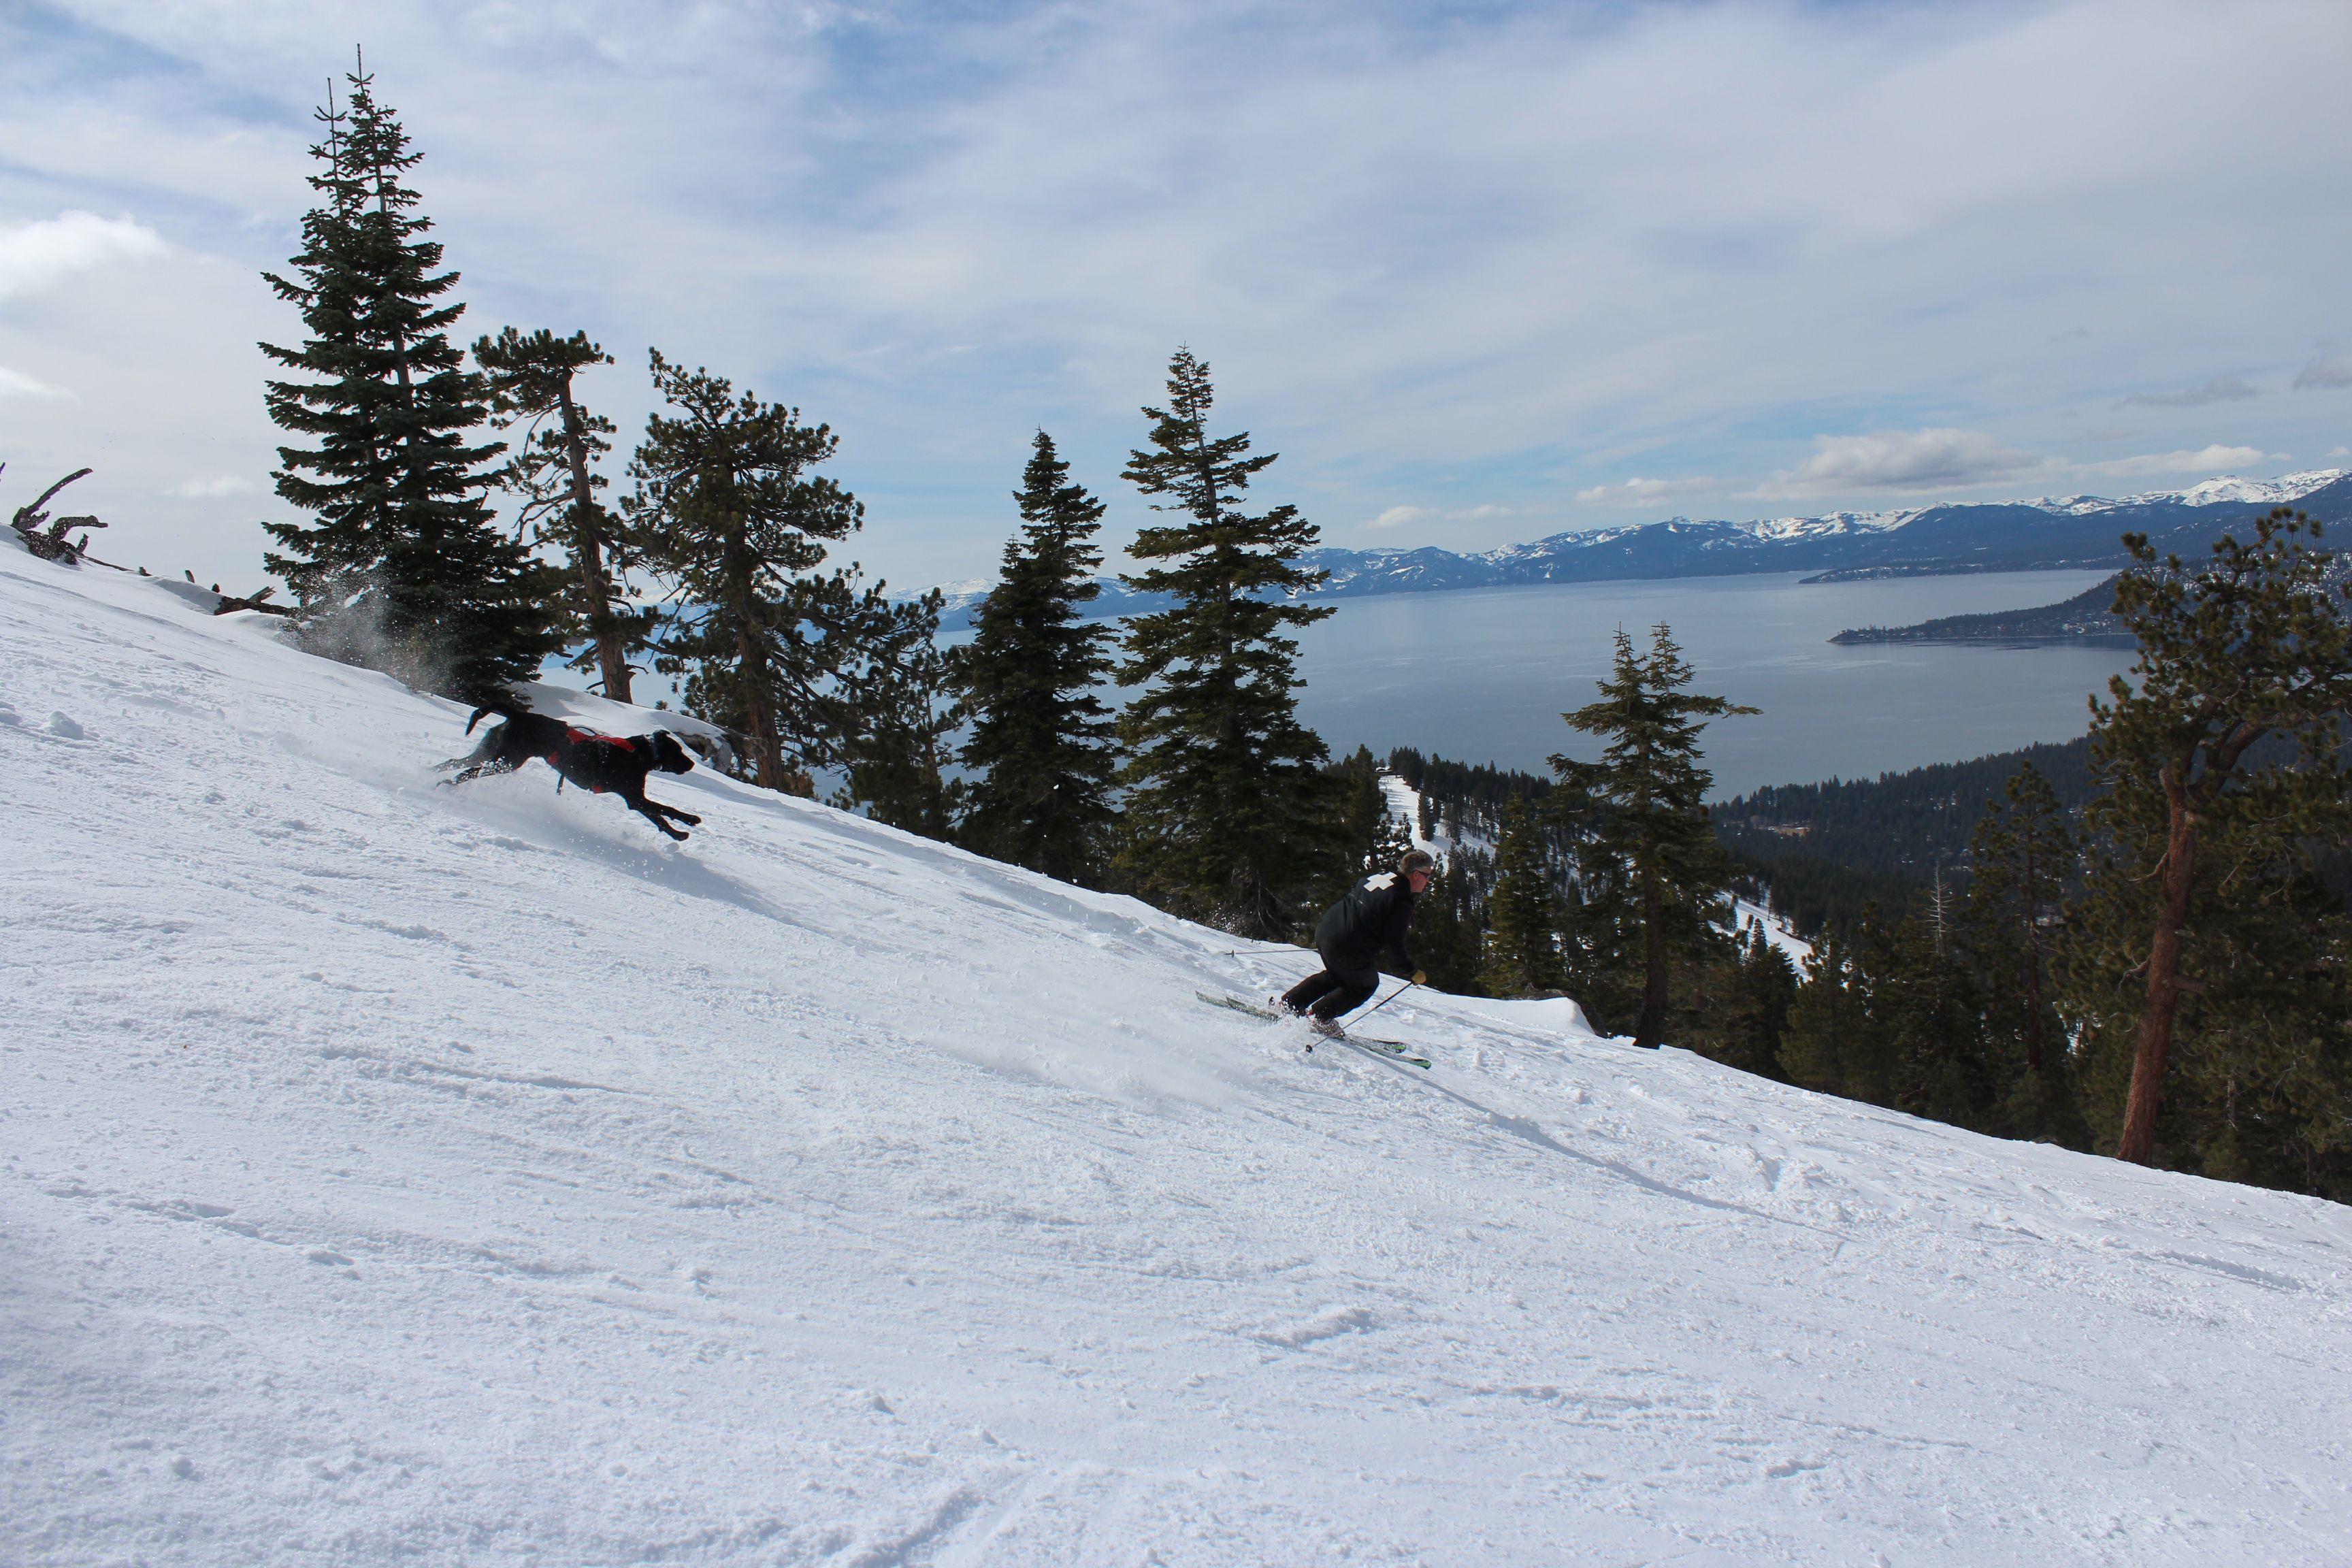 Ski Patrol Dog Thunder And Dennis Ski Resort Skiing